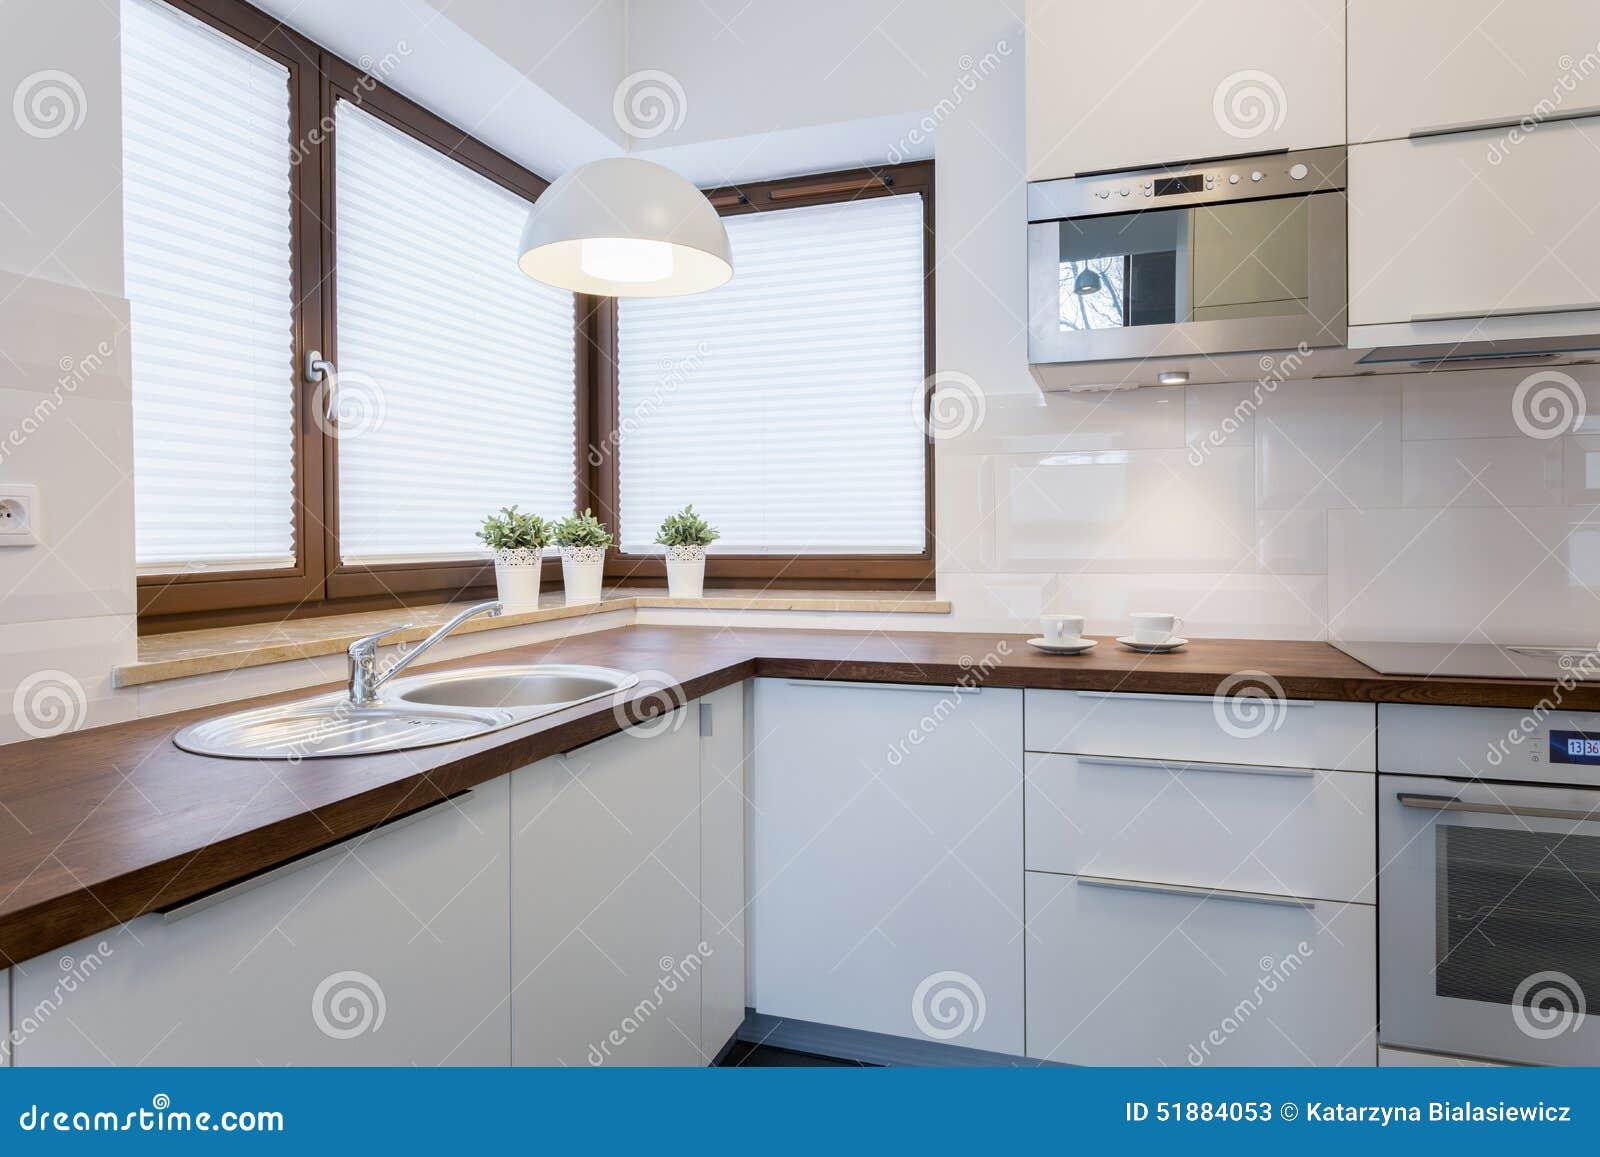 Controsoffitti di legno in cucina tradizionale fotografia - Controsoffitti in cucina ...